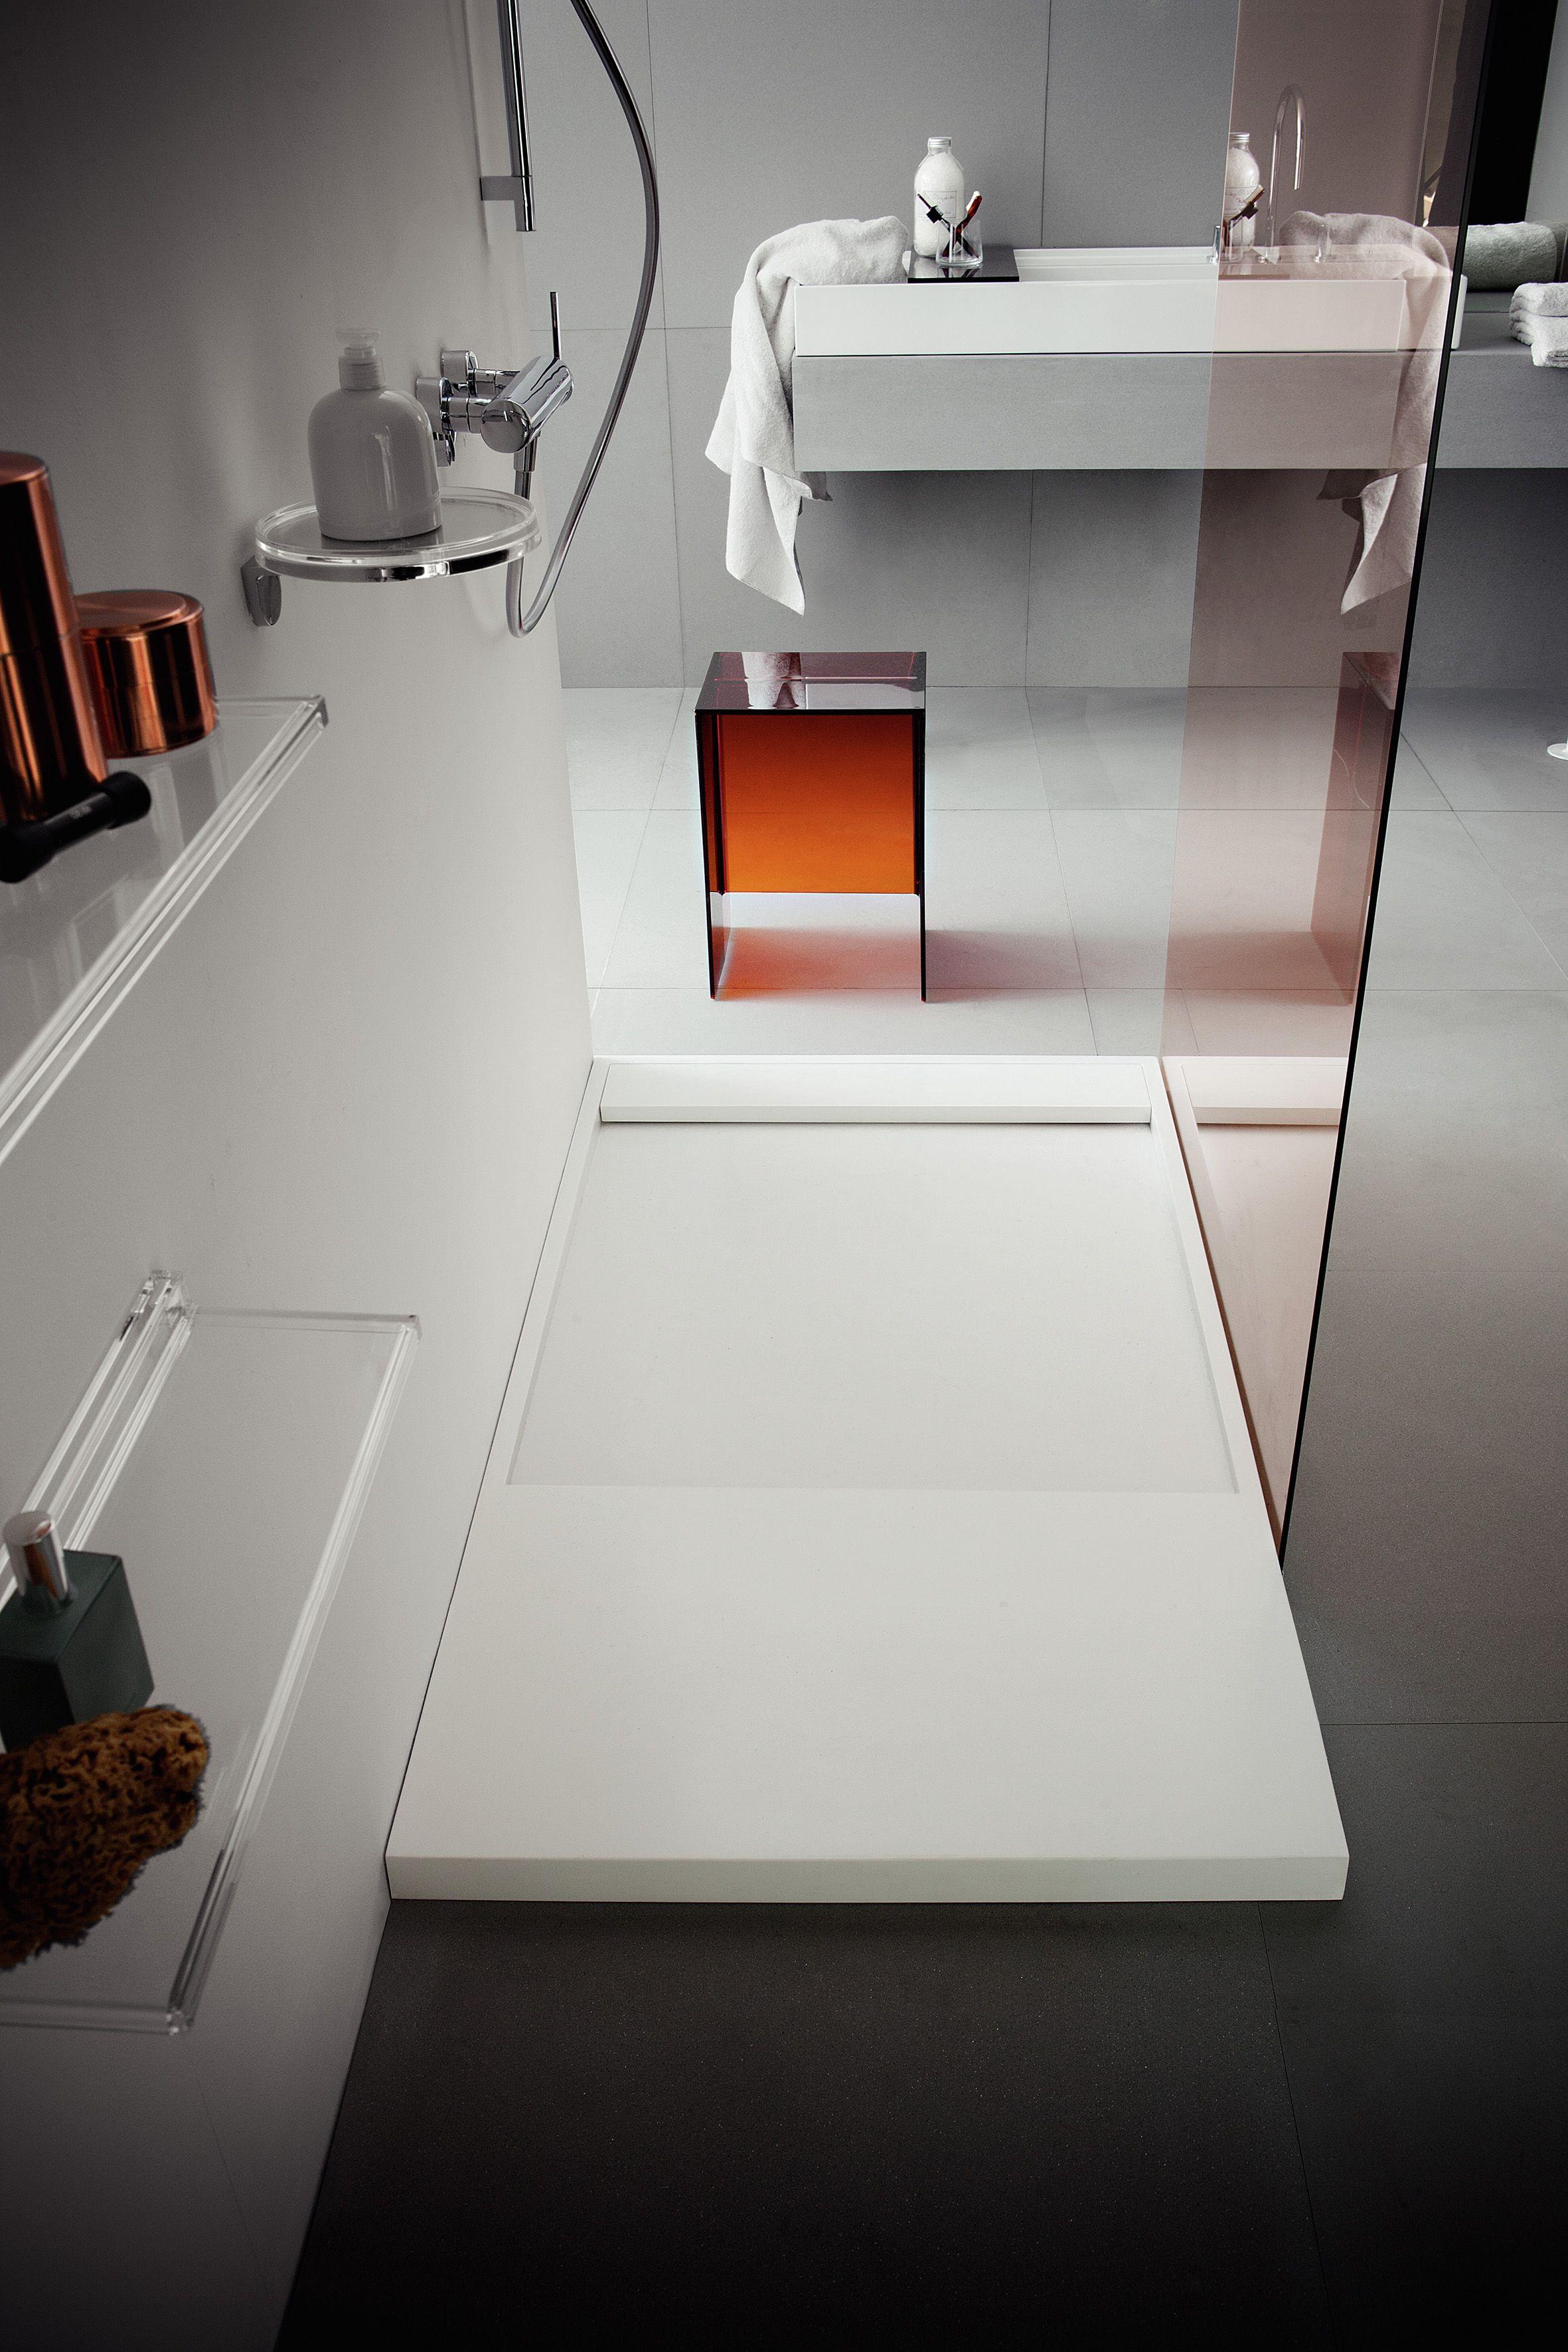 kartell salle de bain salle de bain design. receveur de douche kartell By Laufen en acrylique  blanc.